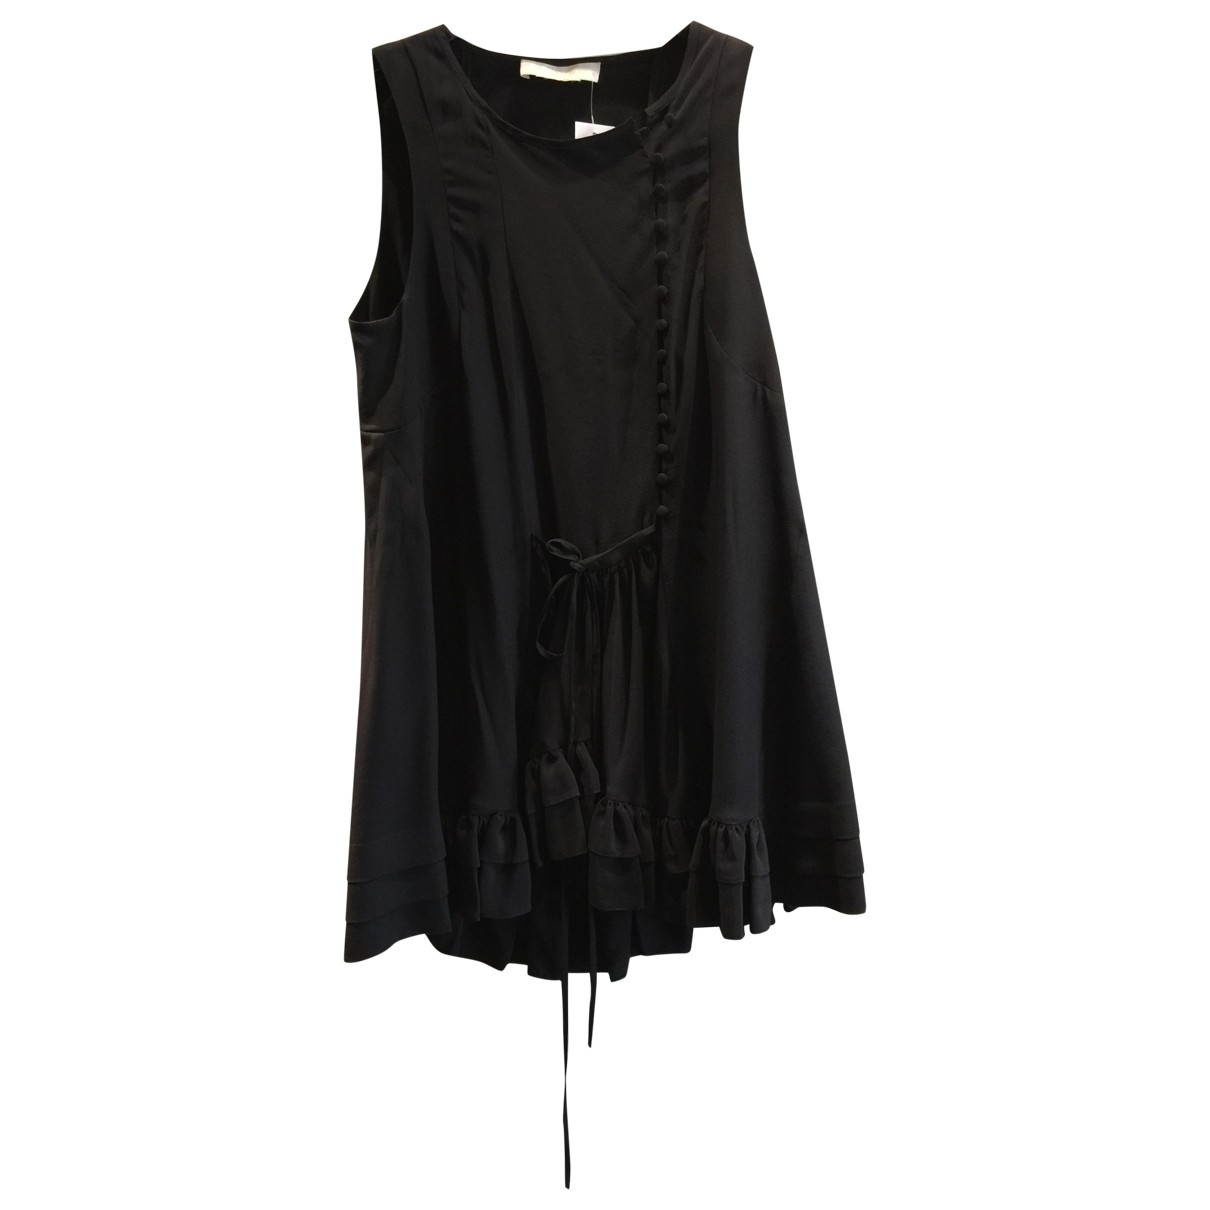 Chloé \N Black dress for Women 40 IT